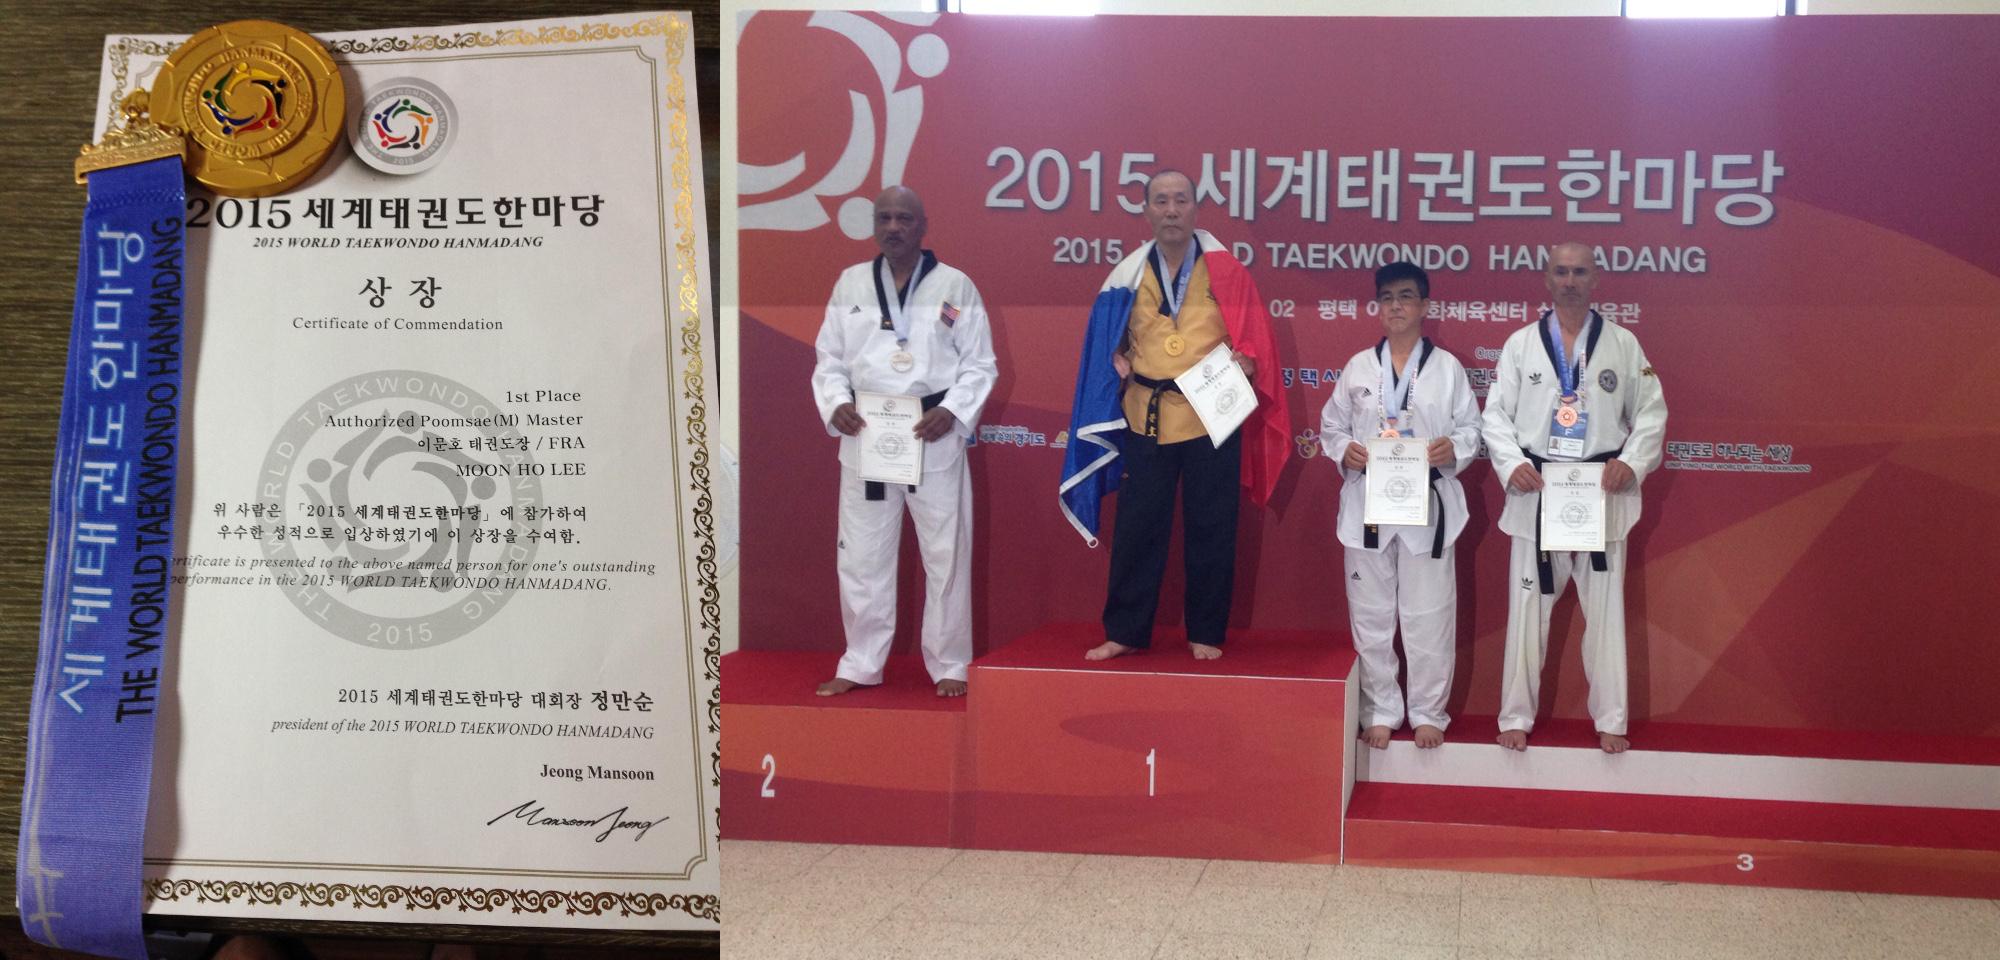 2015 World Tae Kwon Do Hanmadang, Pohang, Pyeongteak : Master Lee world champion for the third time